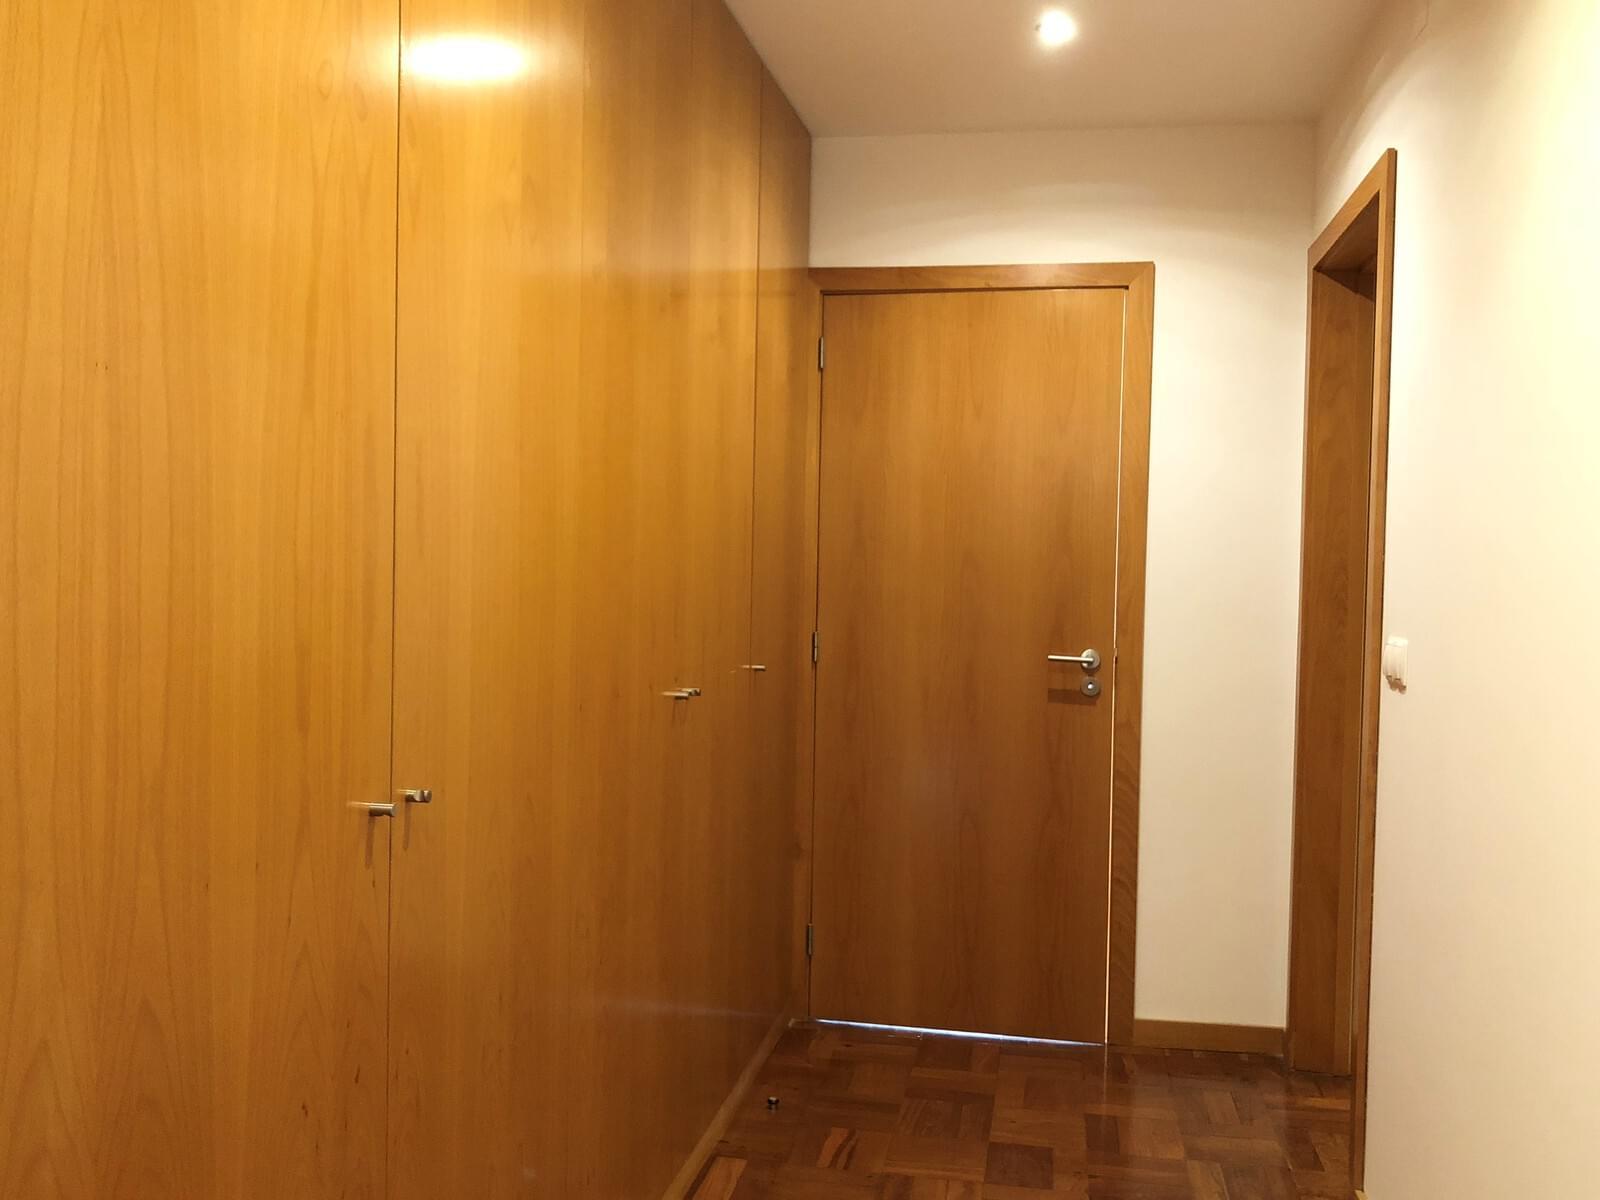 pf18040-apartamento-t3-lisboa-2f6b6adc-db68-4531-bc98-f566ce941803